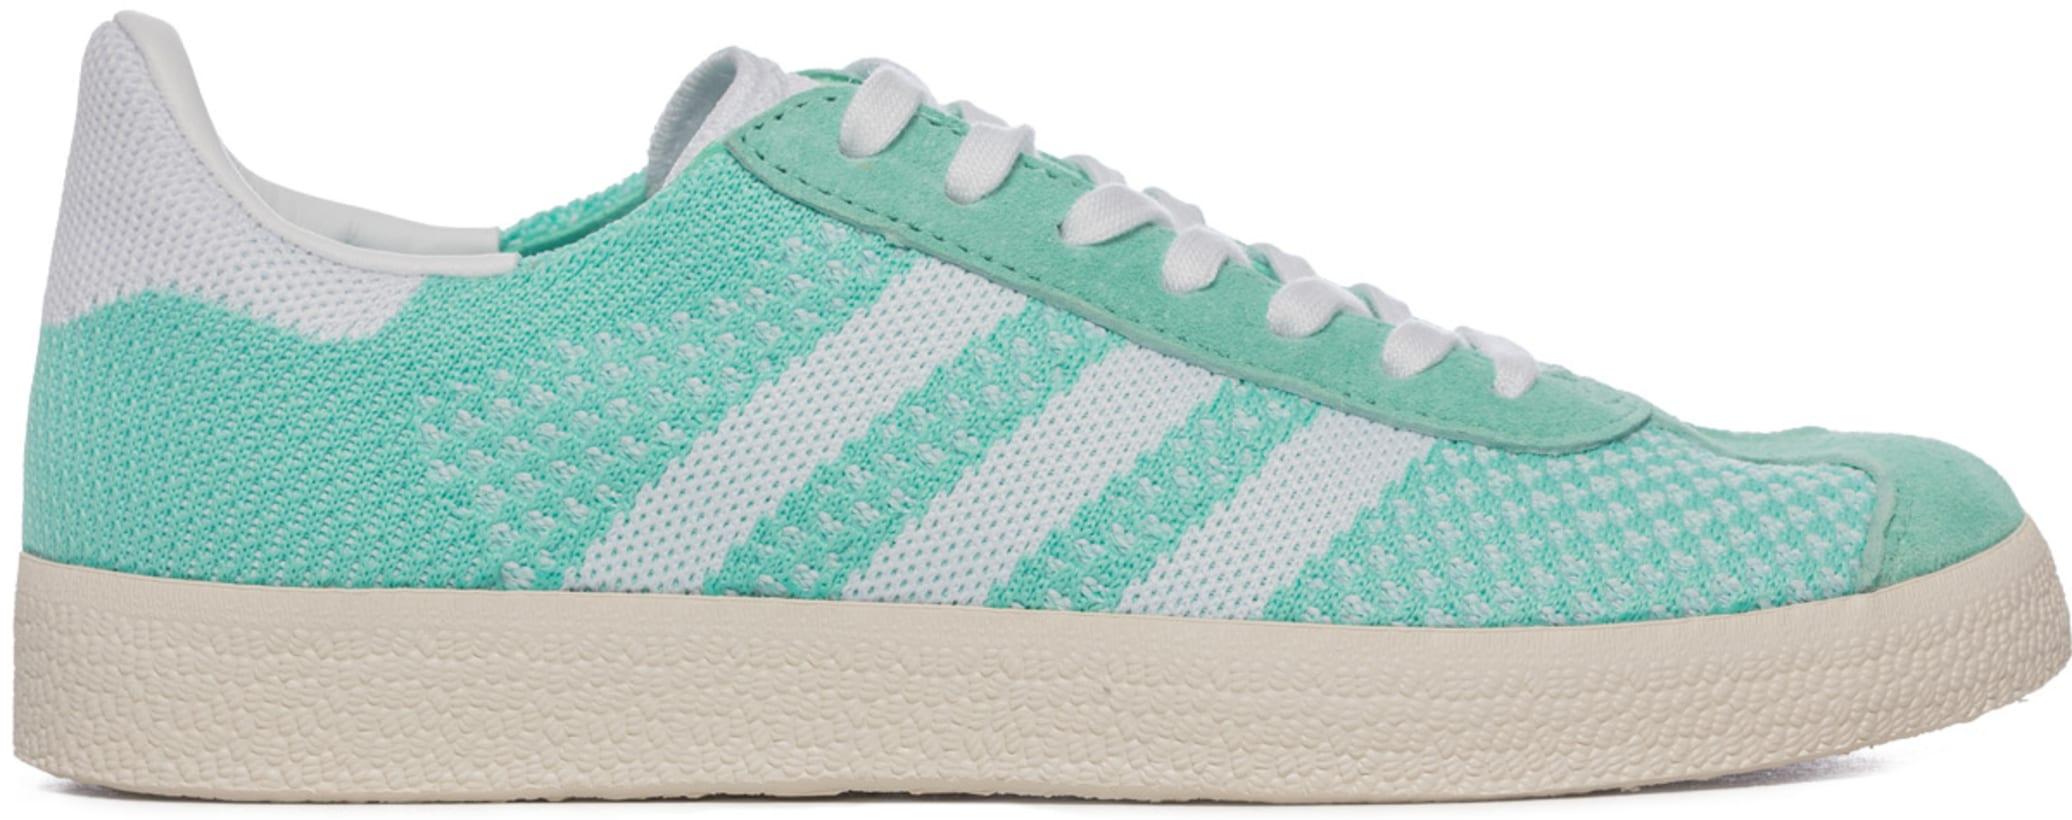 huge selection of bd517 7a593 adidas Originals: Gazelle Primeknit - Easy Green/Footwear White ...